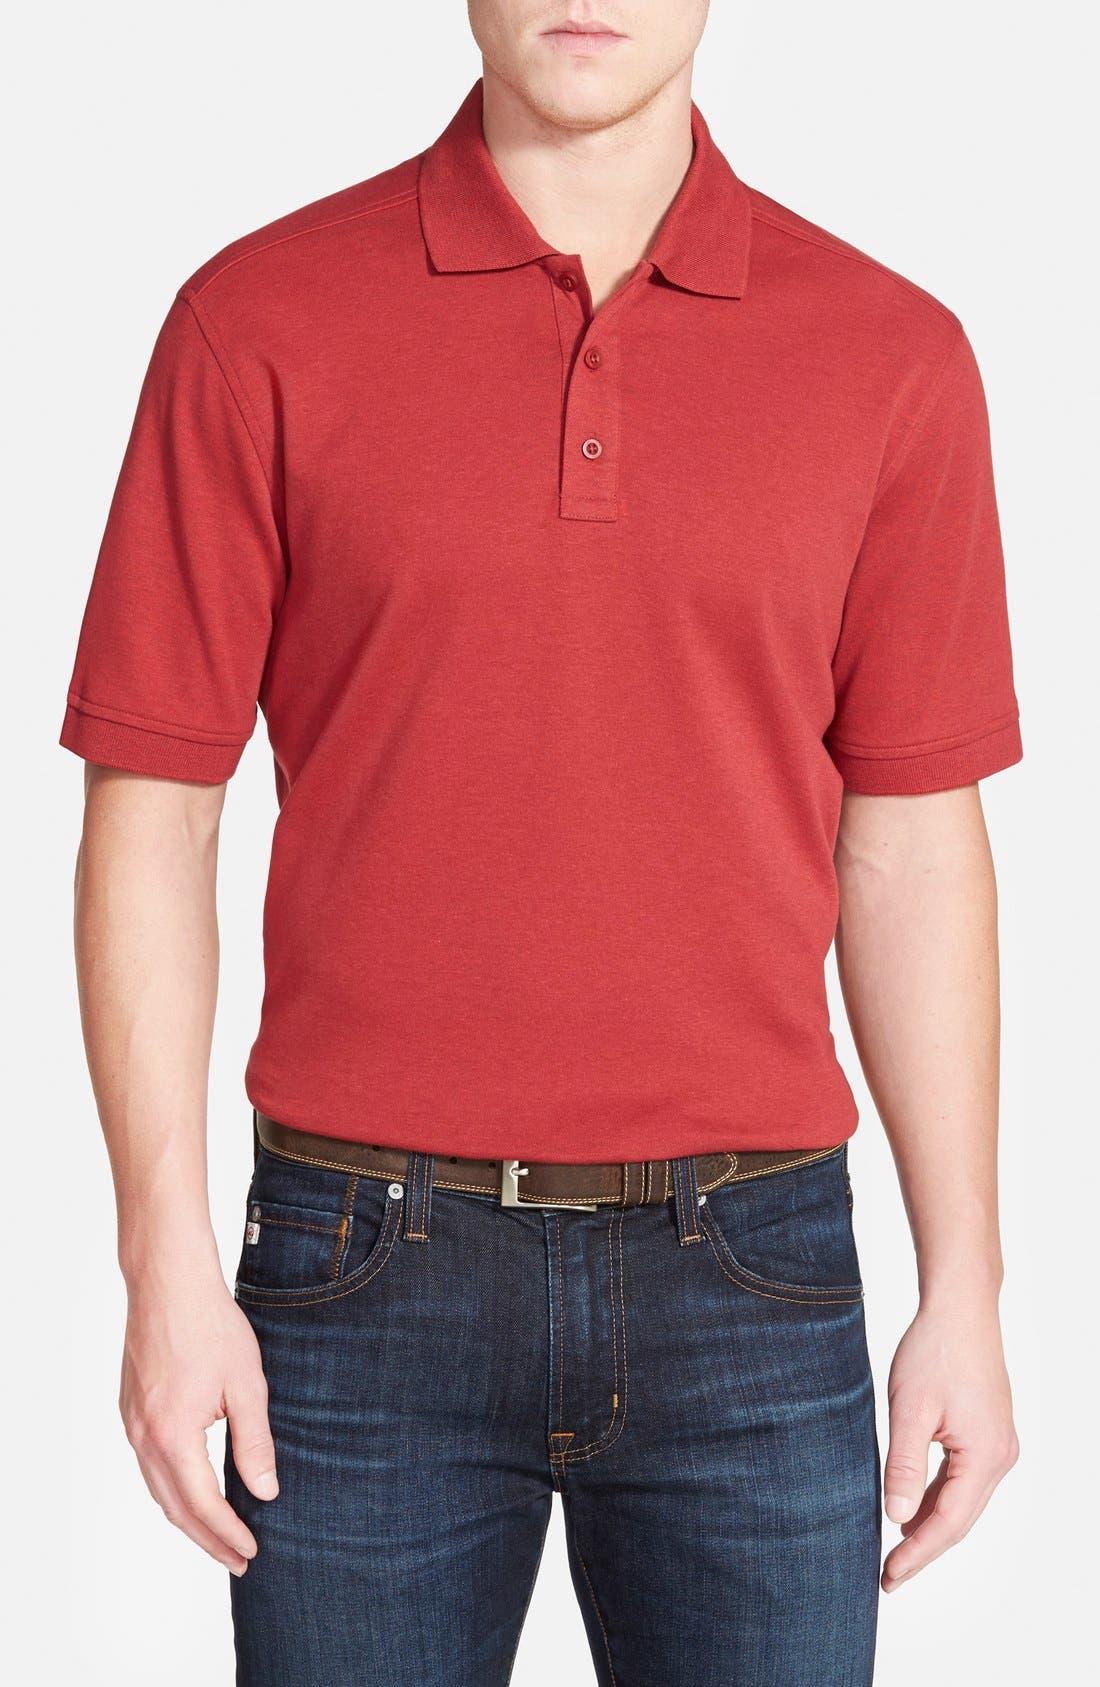 Nordstrom Men's Shop Slim Fit Interlock Knit Polo